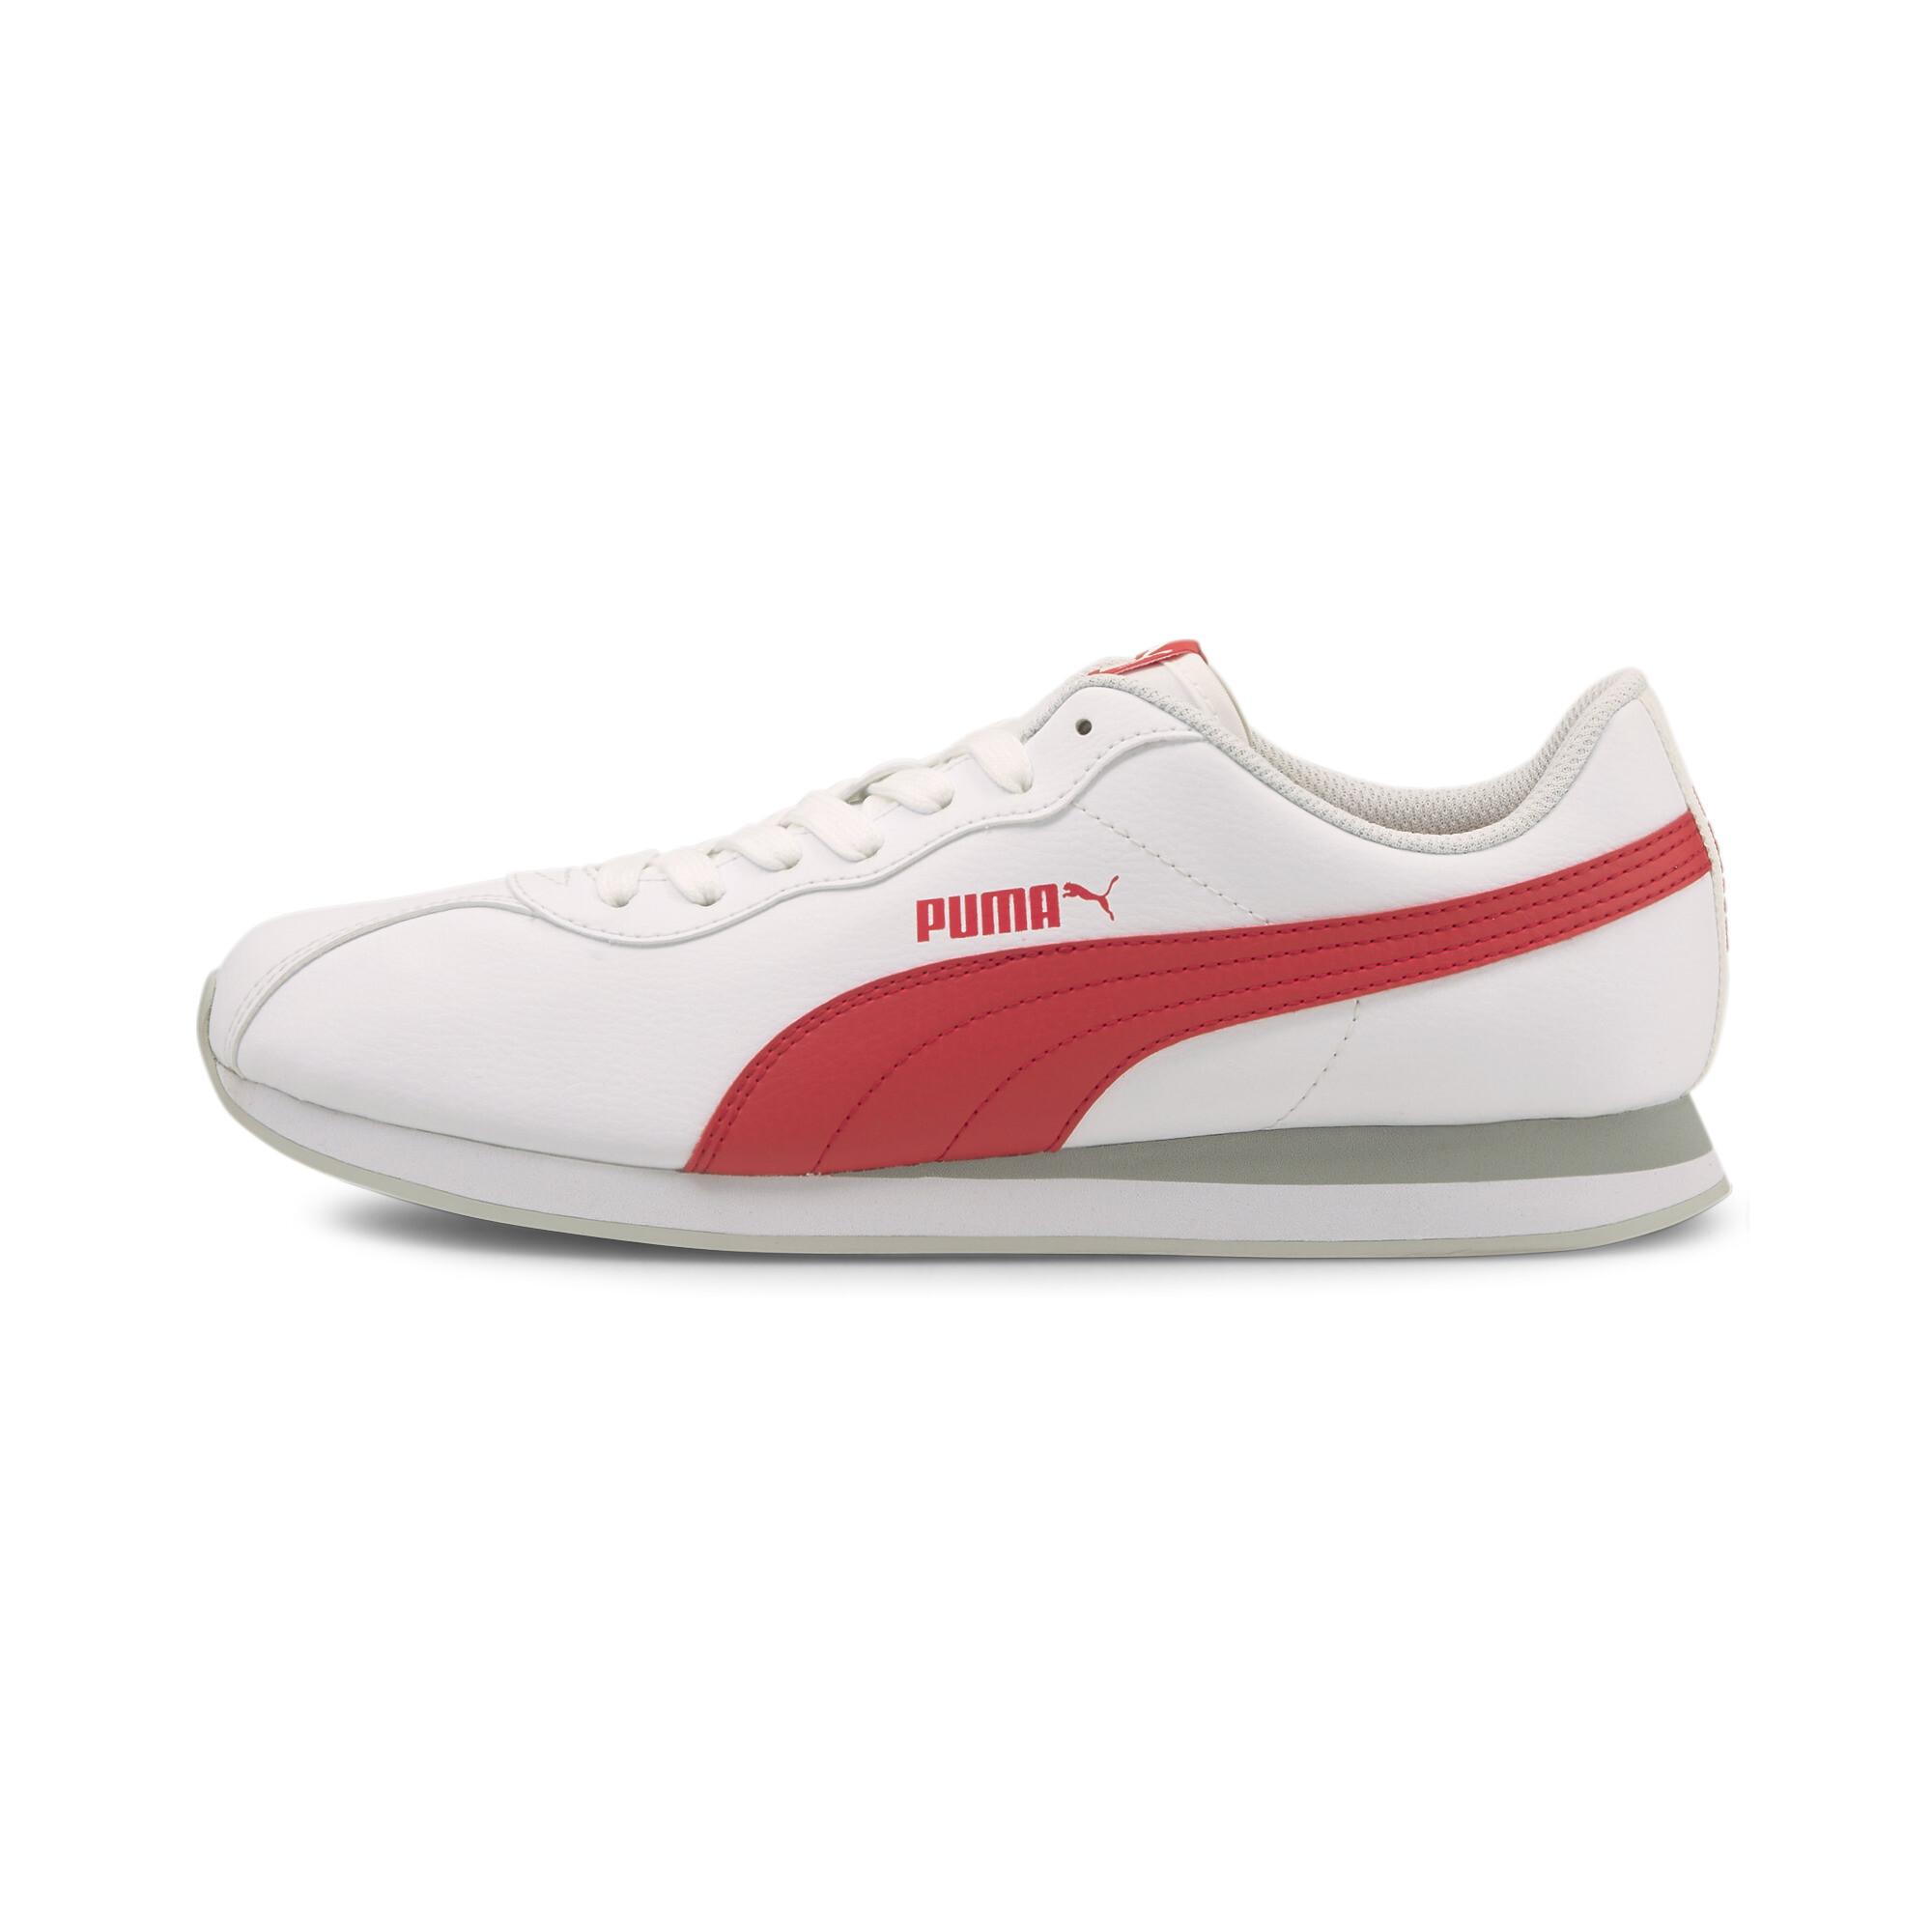 thumbnail 41 - PUMA Men's Turin II Sneakers